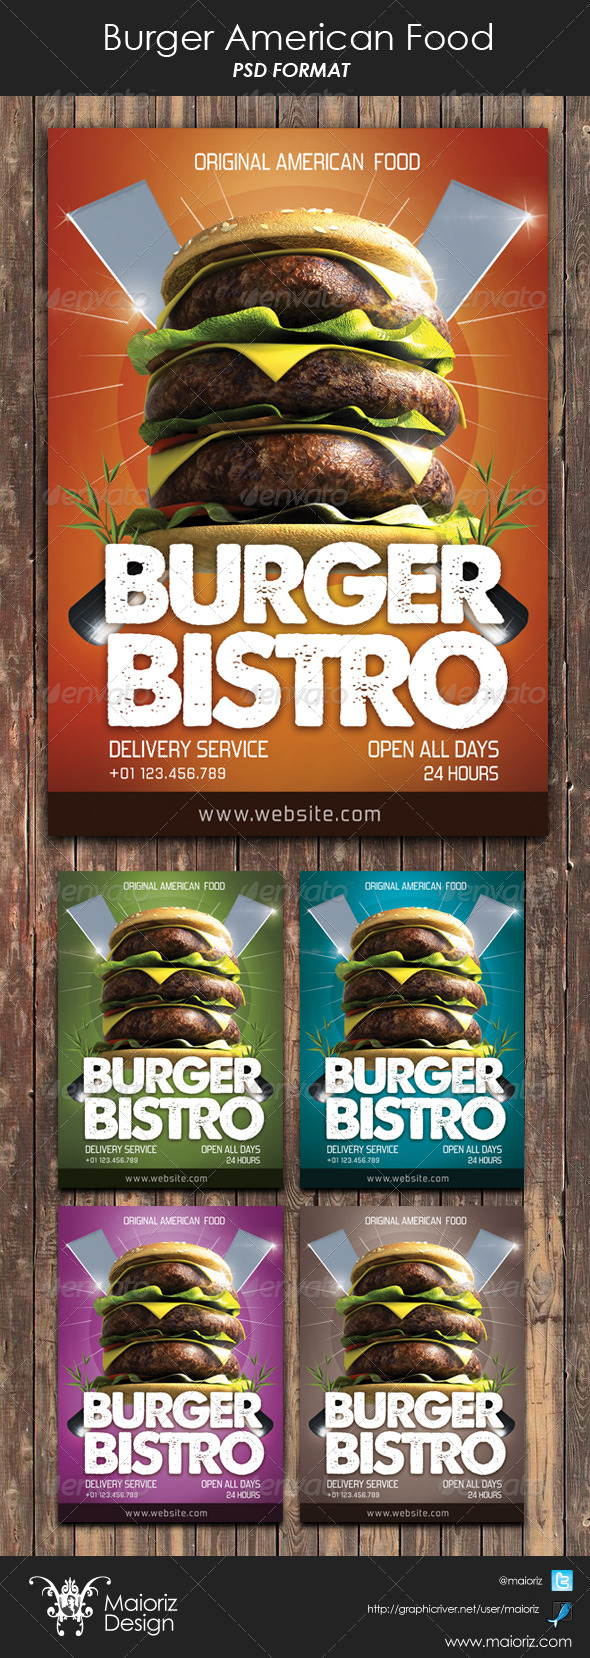 Burger American Food Flyer - Restaurant Flyers